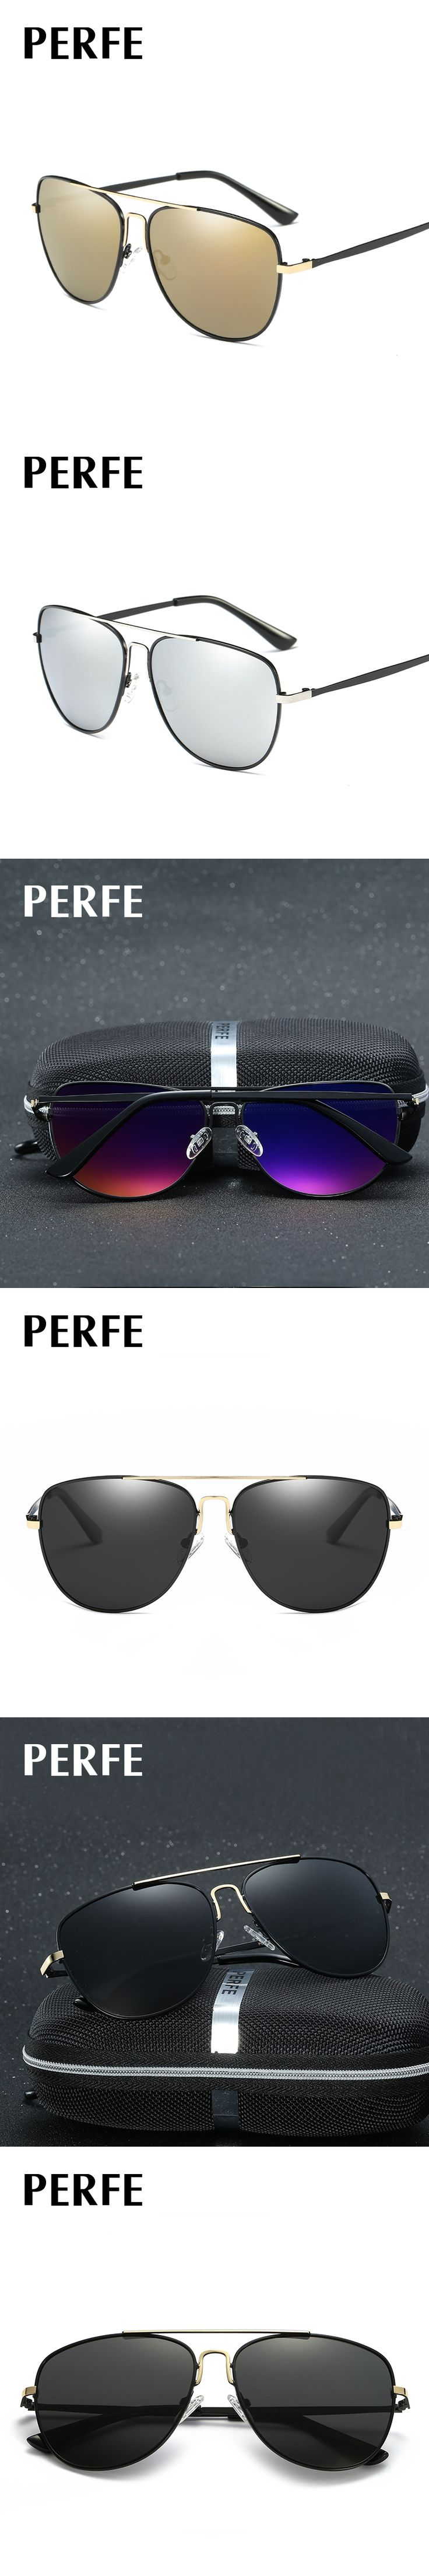 Polarized Sunglasses Men Driver Mirror Sun glasses Male Female Sports Eyewear For Men Prescription glasses 135